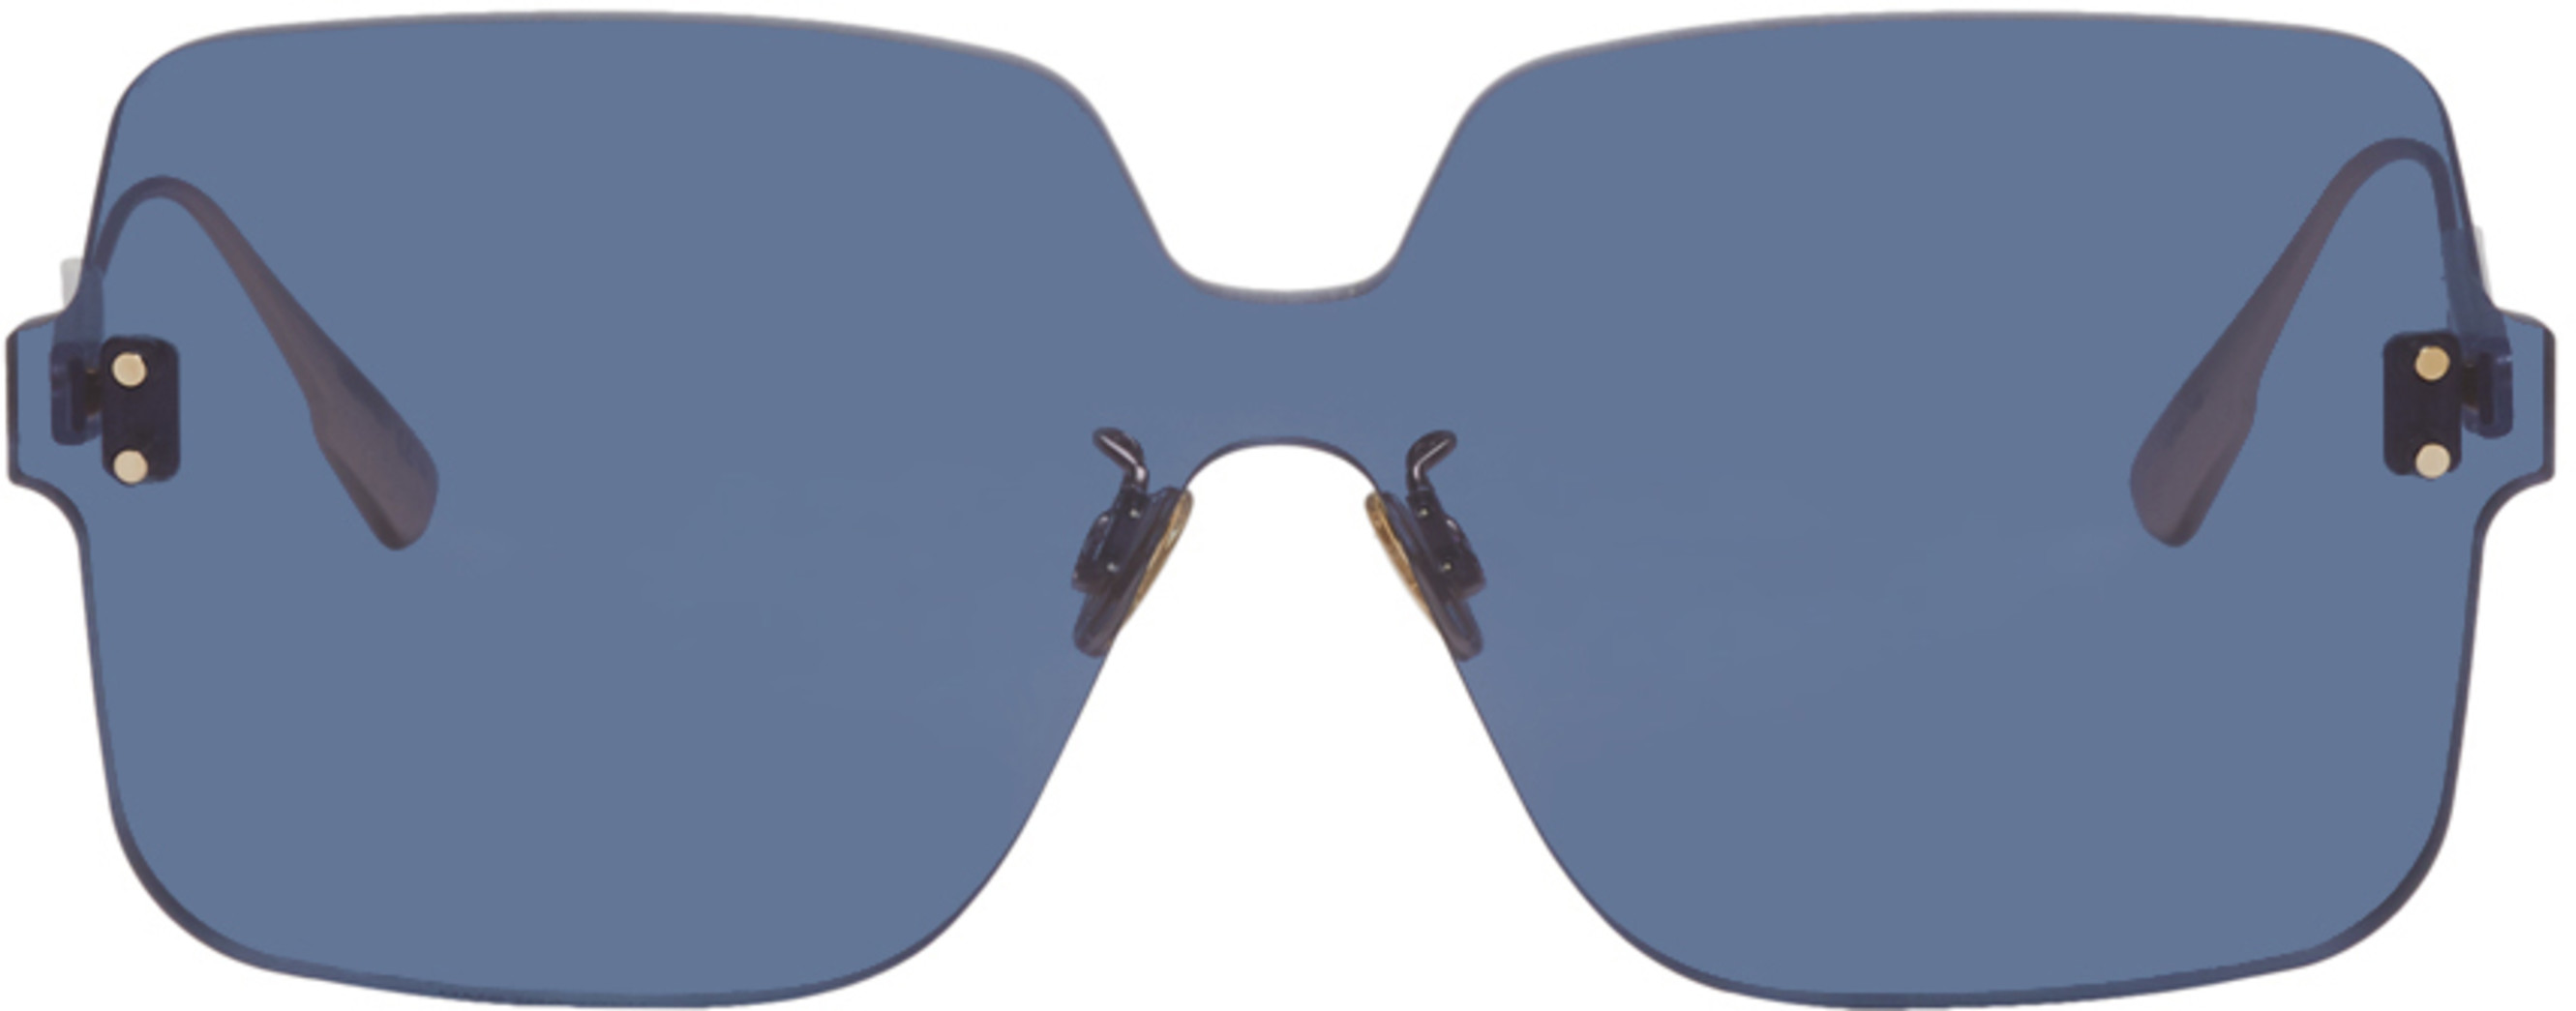 0e91504669689 Dior eyewear for Women